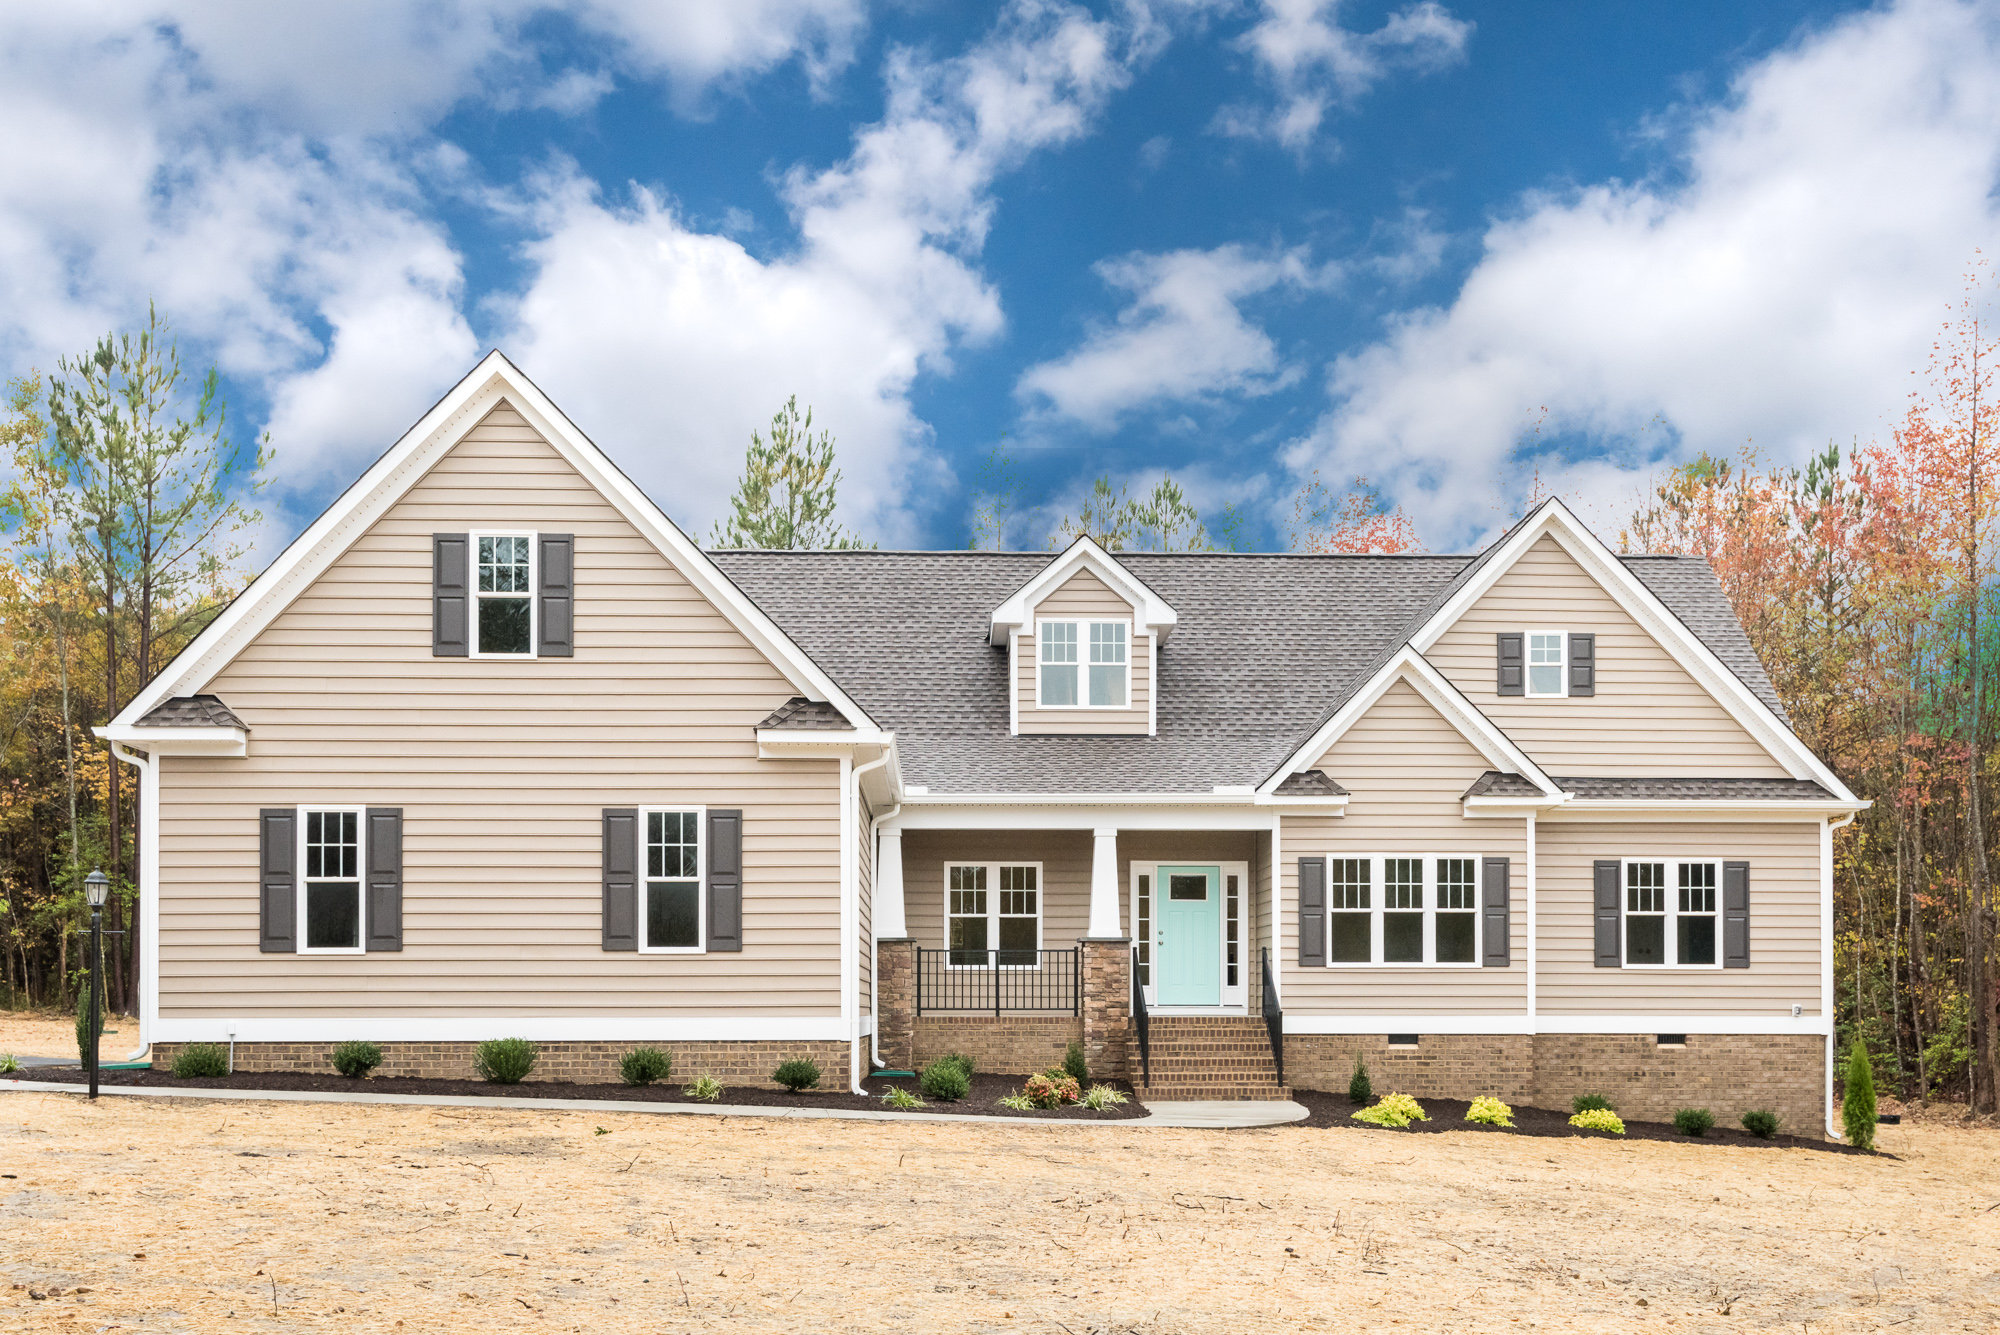 Shurm Homes - The Modified Jefferson